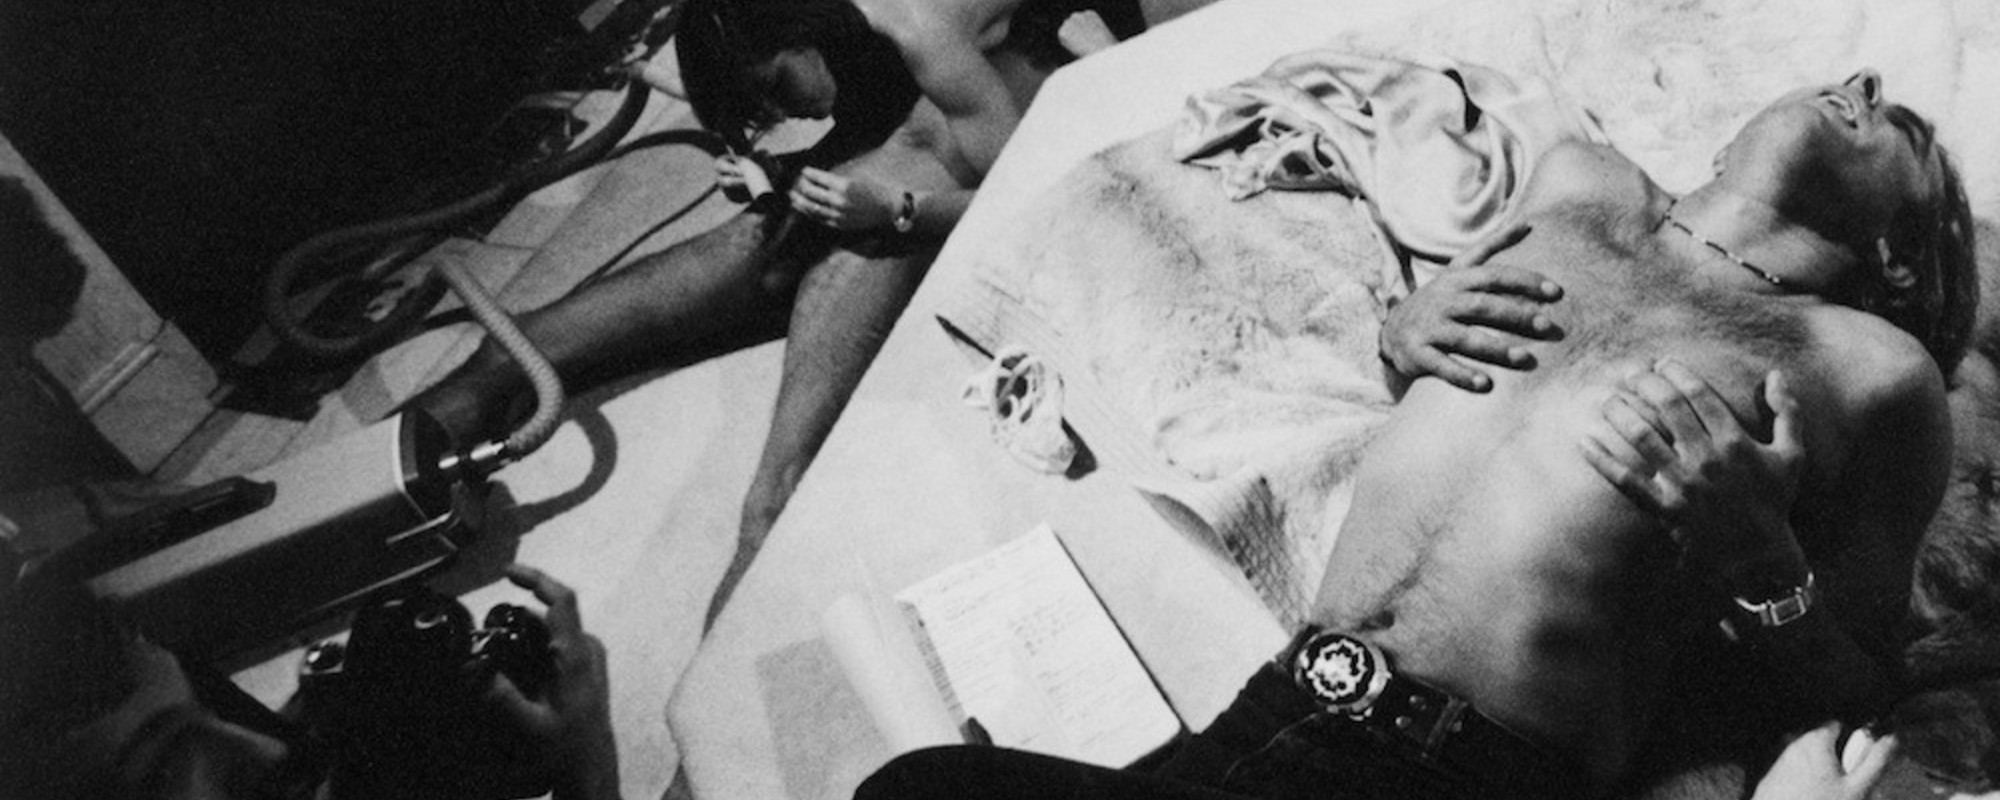 Fotografii din epoca de aur a pornografiei franceze